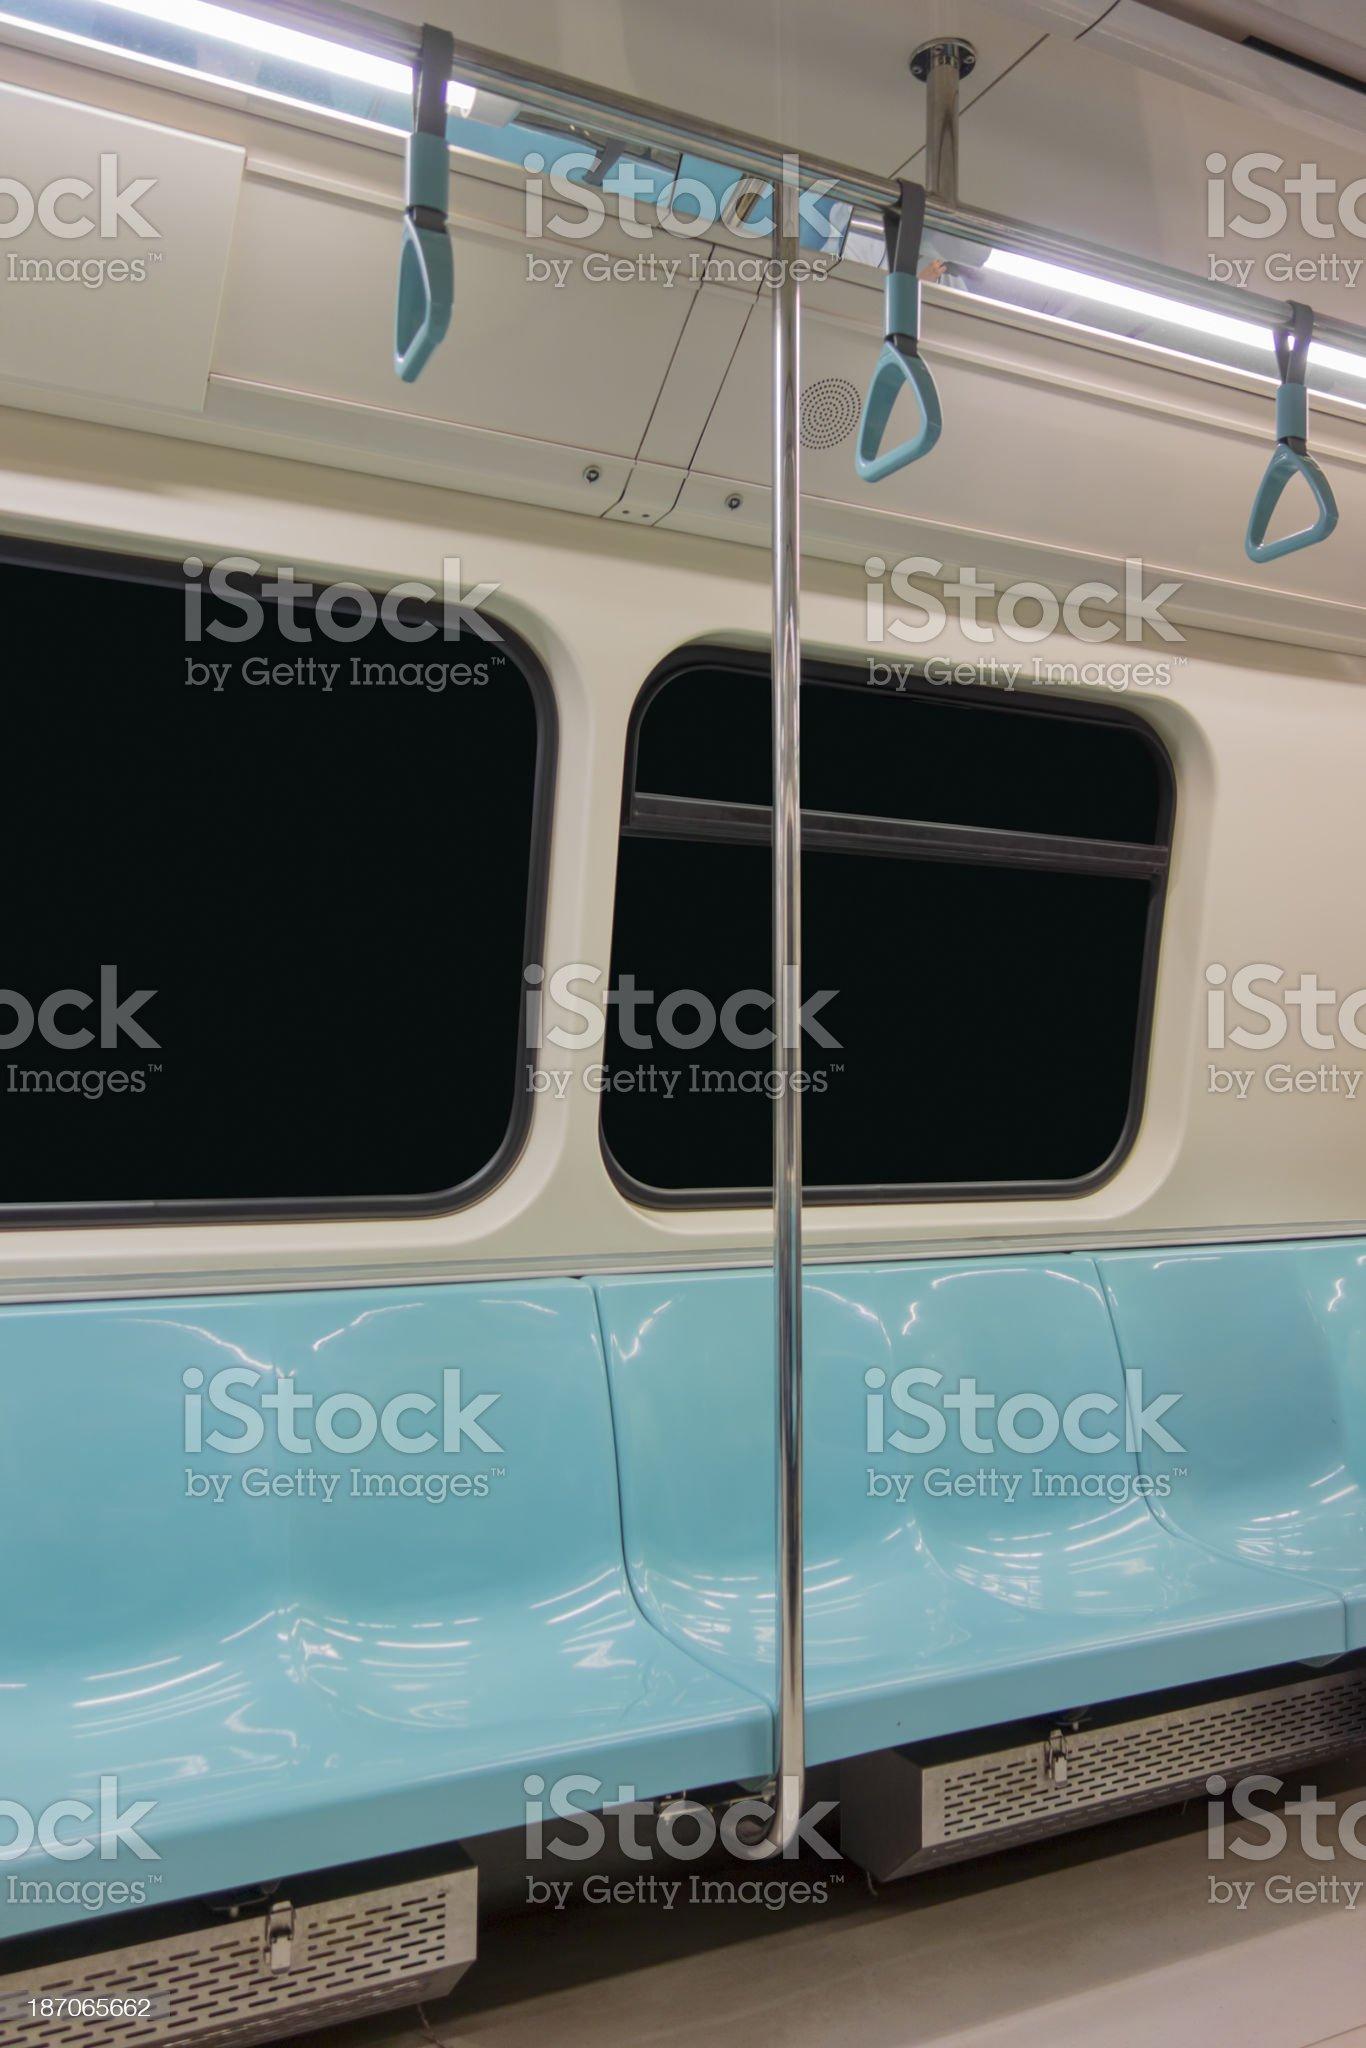 Interiors of a subway train royalty-free stock photo